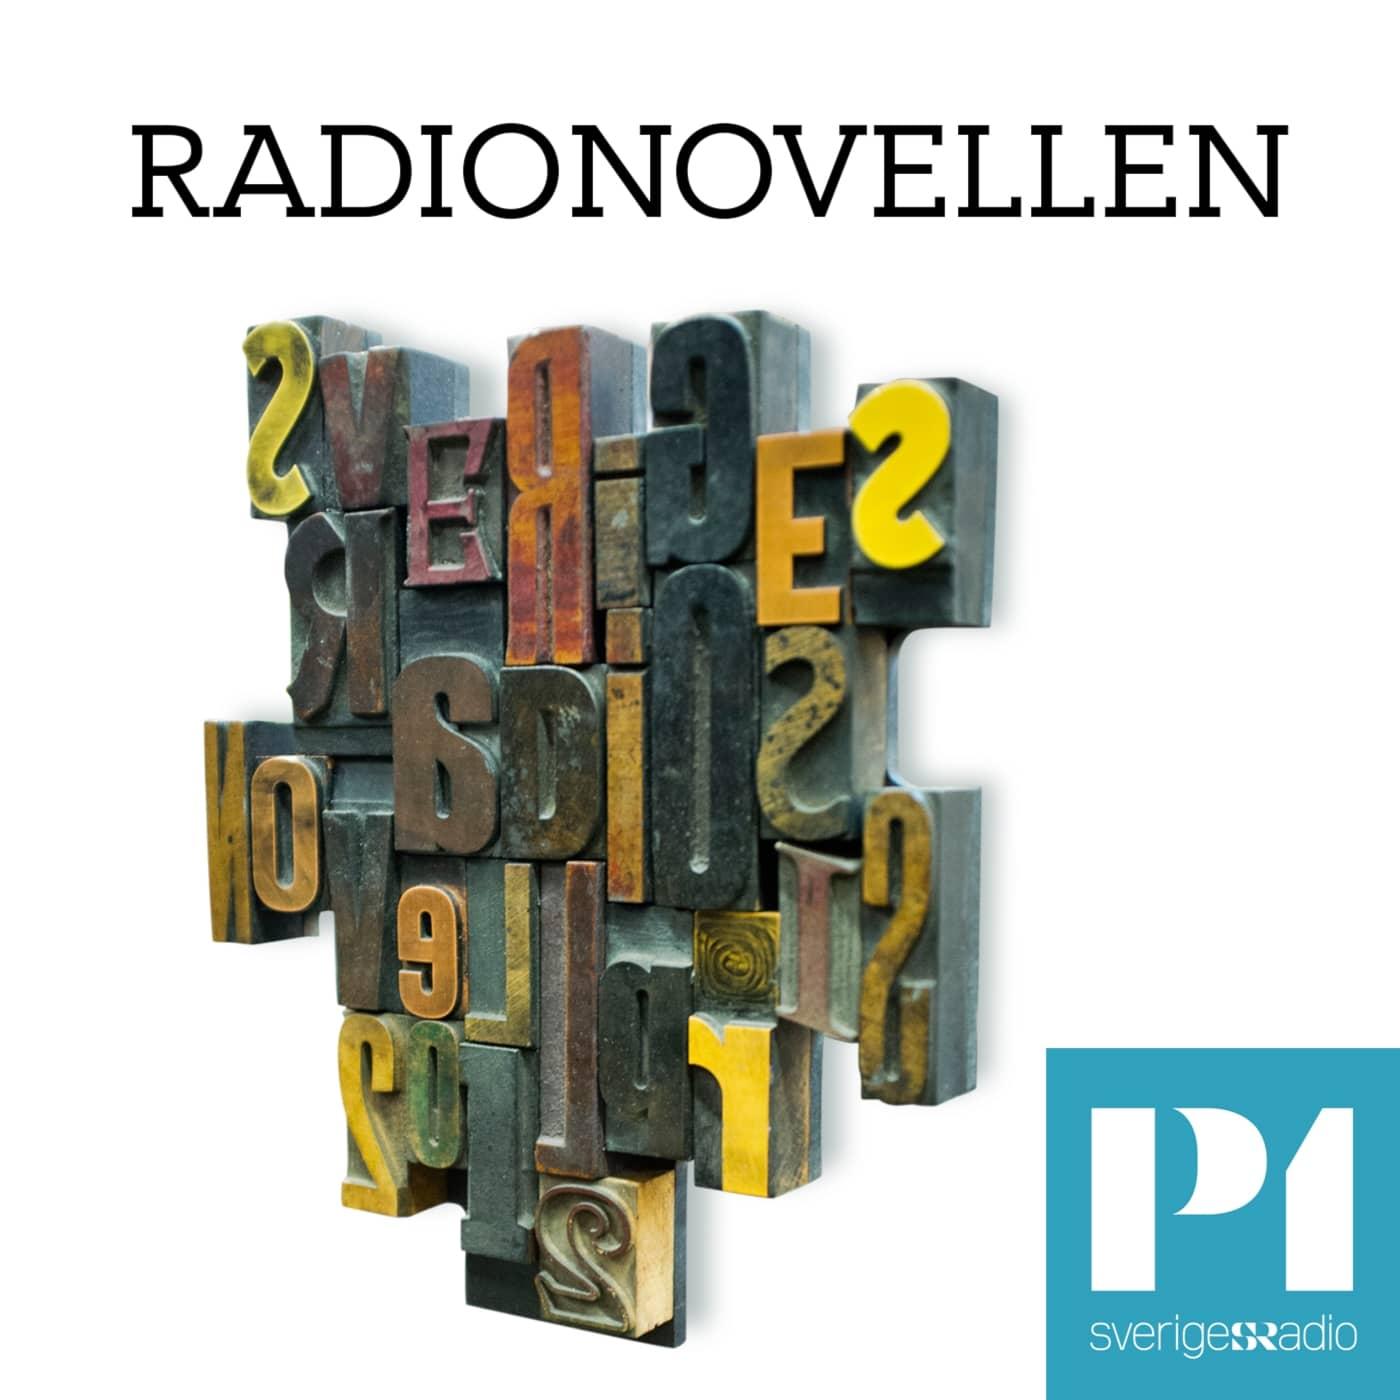 Radionovellen